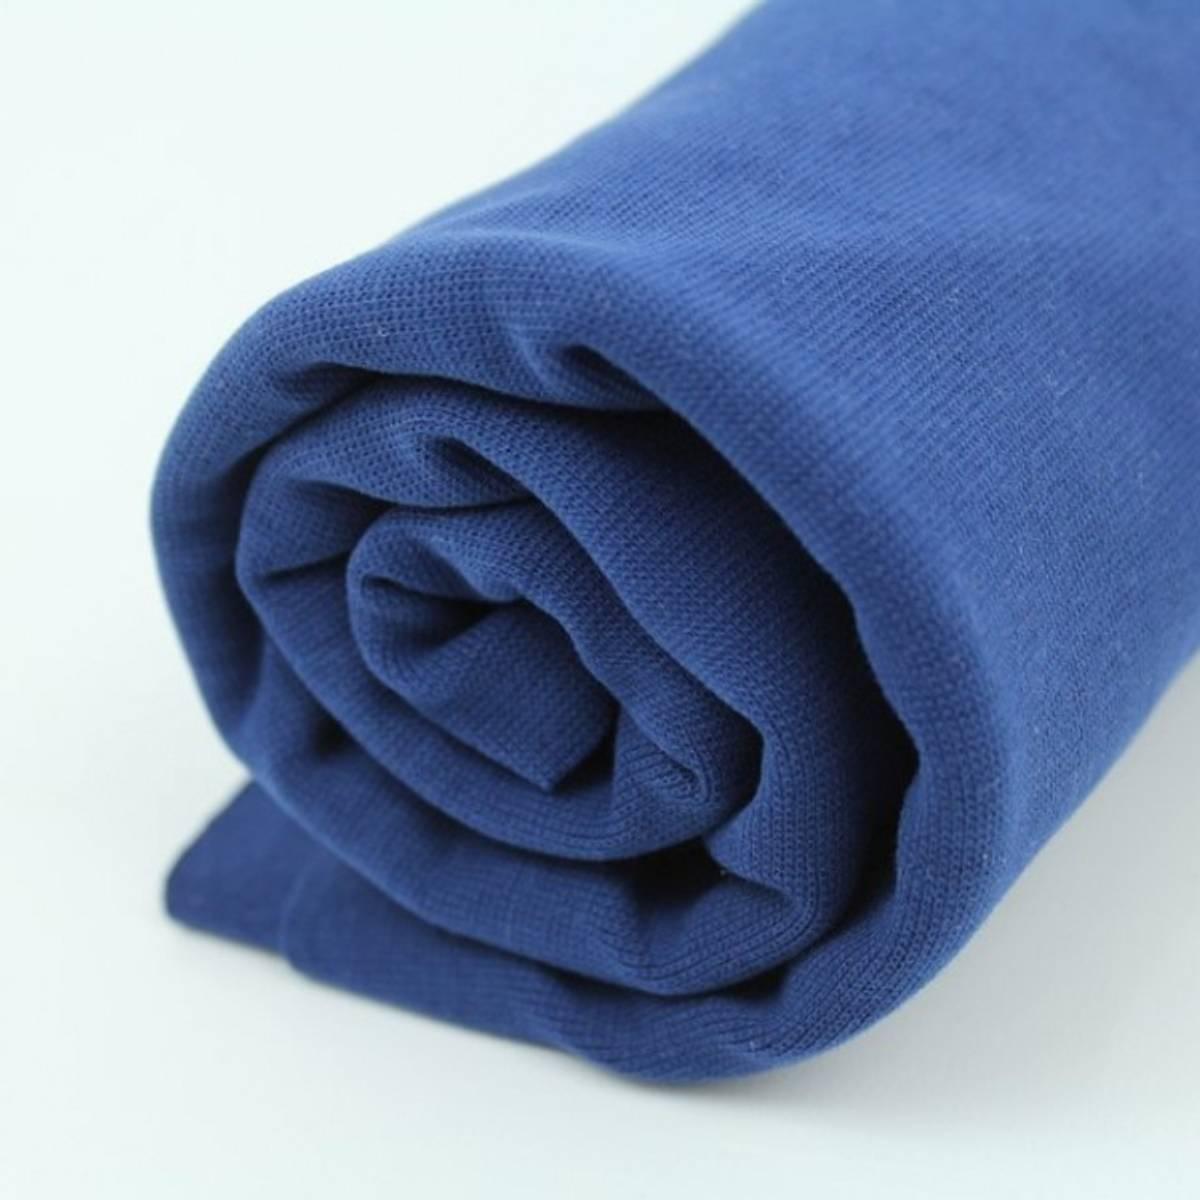 Økologisk ribb, marineblå